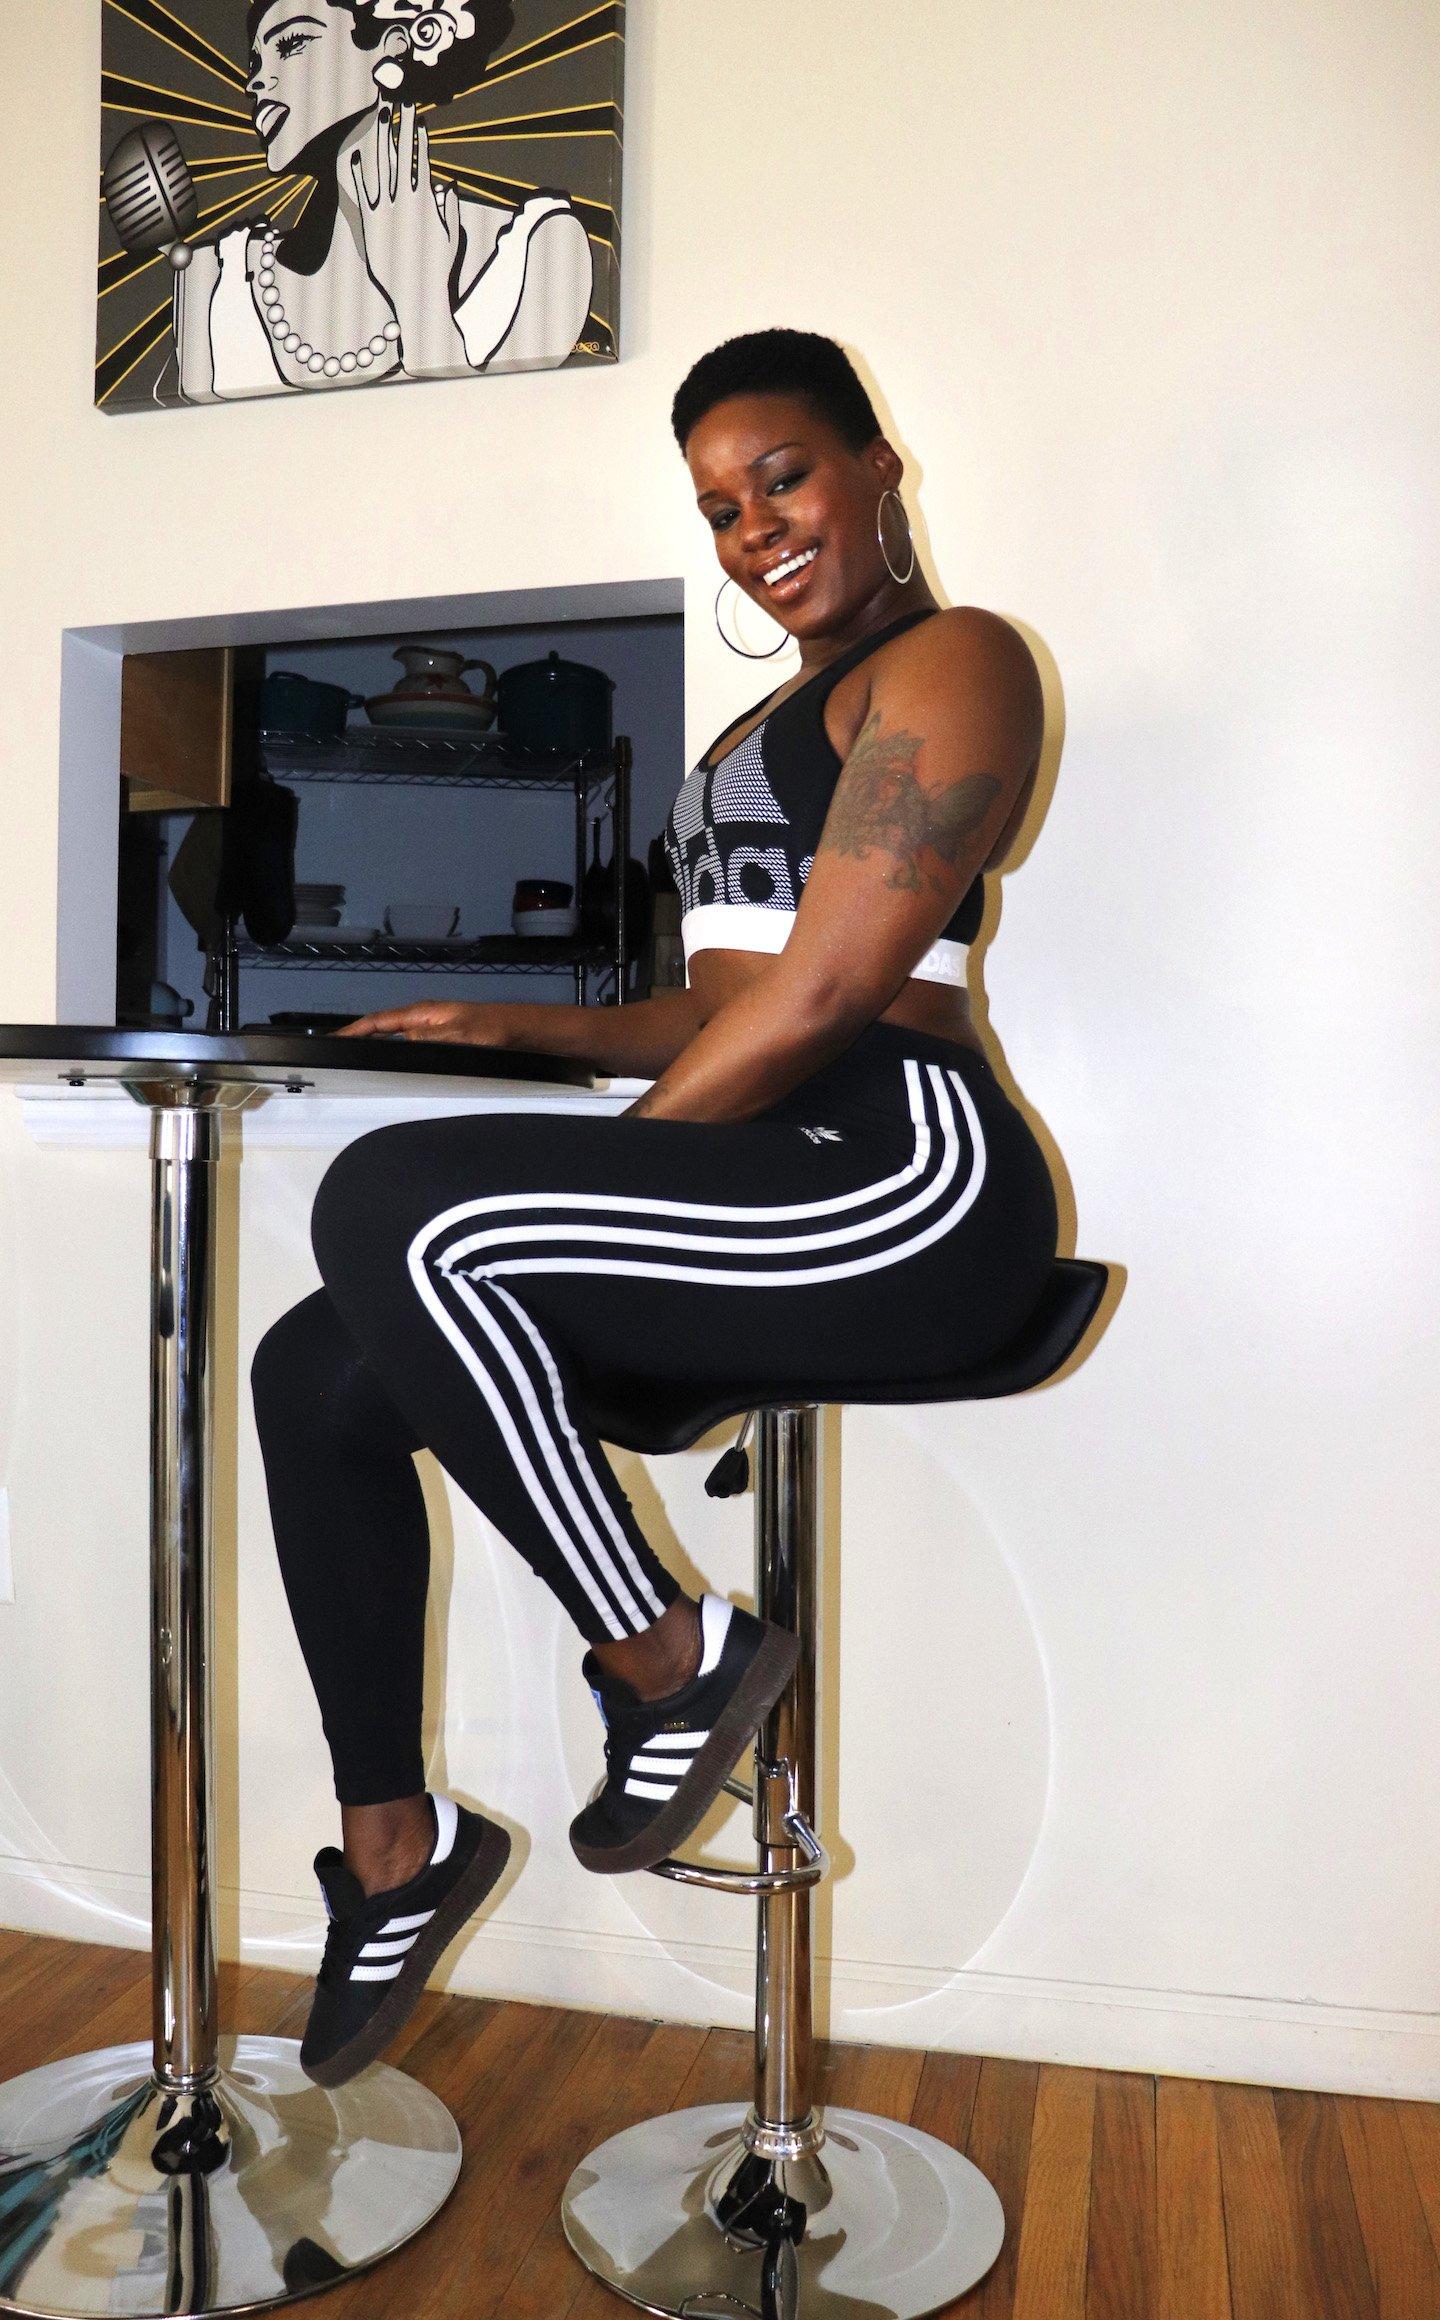 adidas Alphaskin Bra, 3 Stripe Legging, Samba Rose Outfit